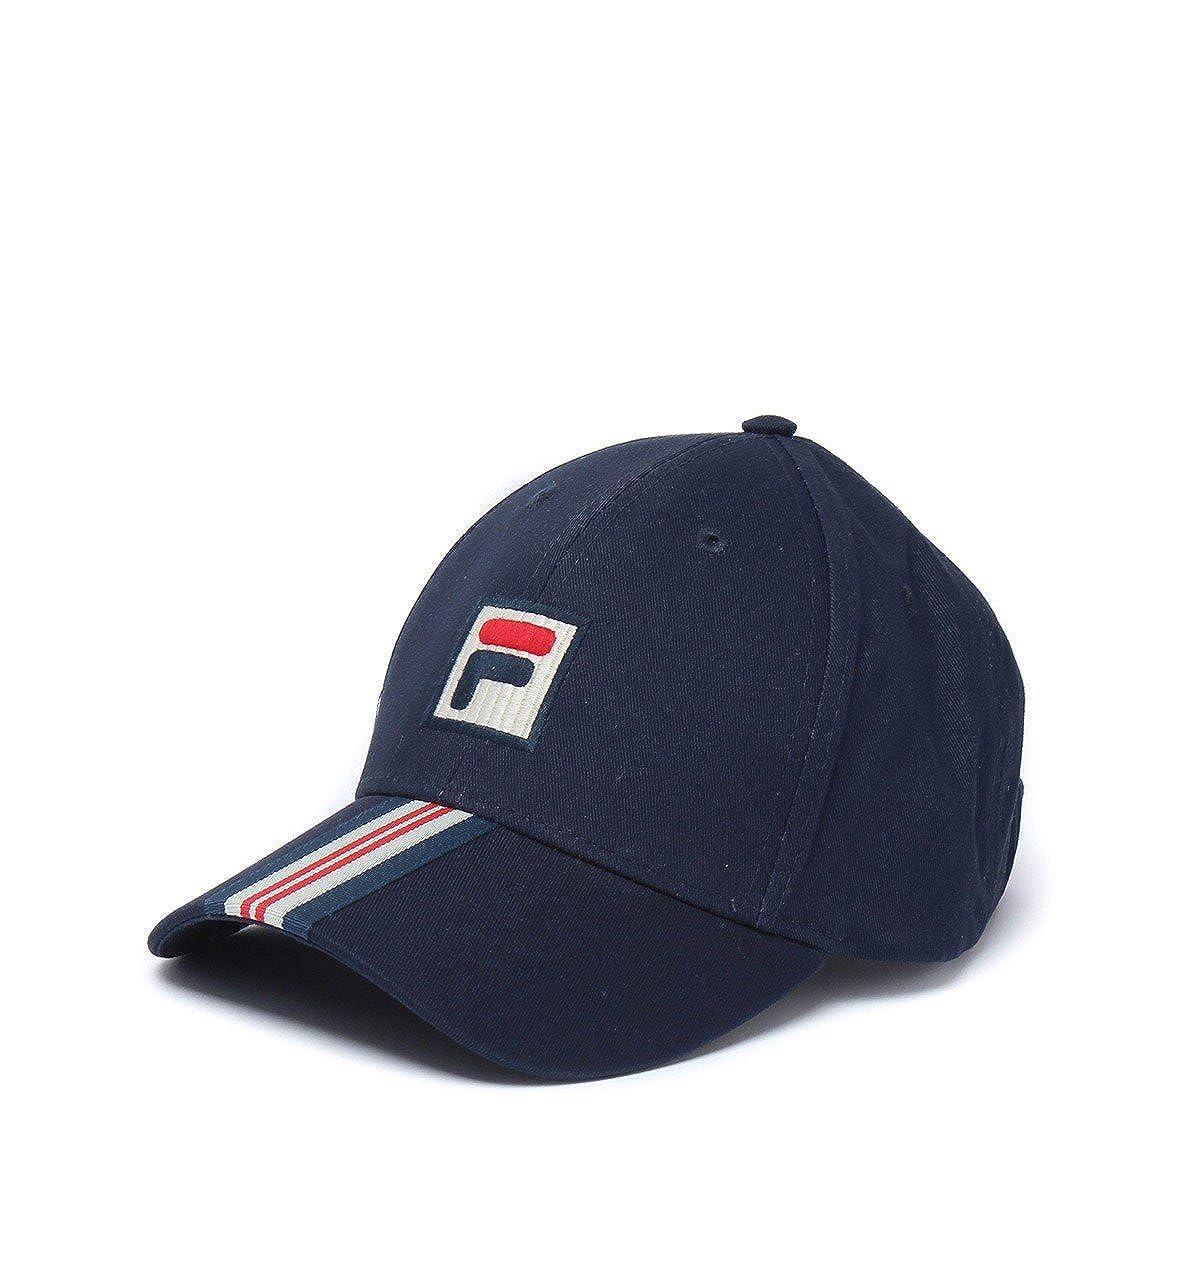 Fila Vintage Walker Baseball Curved Visor Cap Hat Navy Blue Peacoat   Amazon.co.uk  Clothing 22106cab068